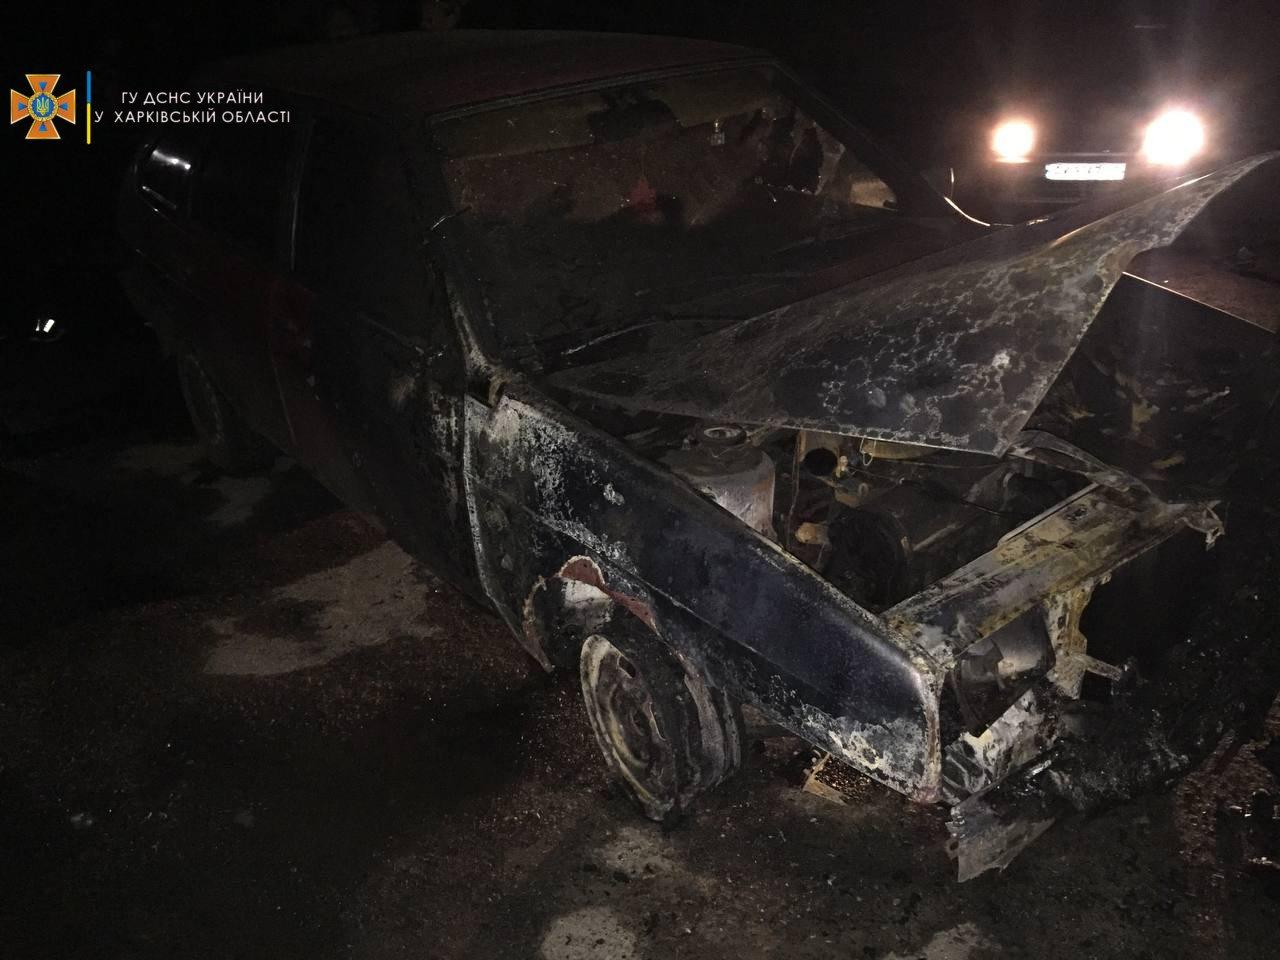 Ночью на Алексеевке подожгли два авто, - ФОТО, фото-1